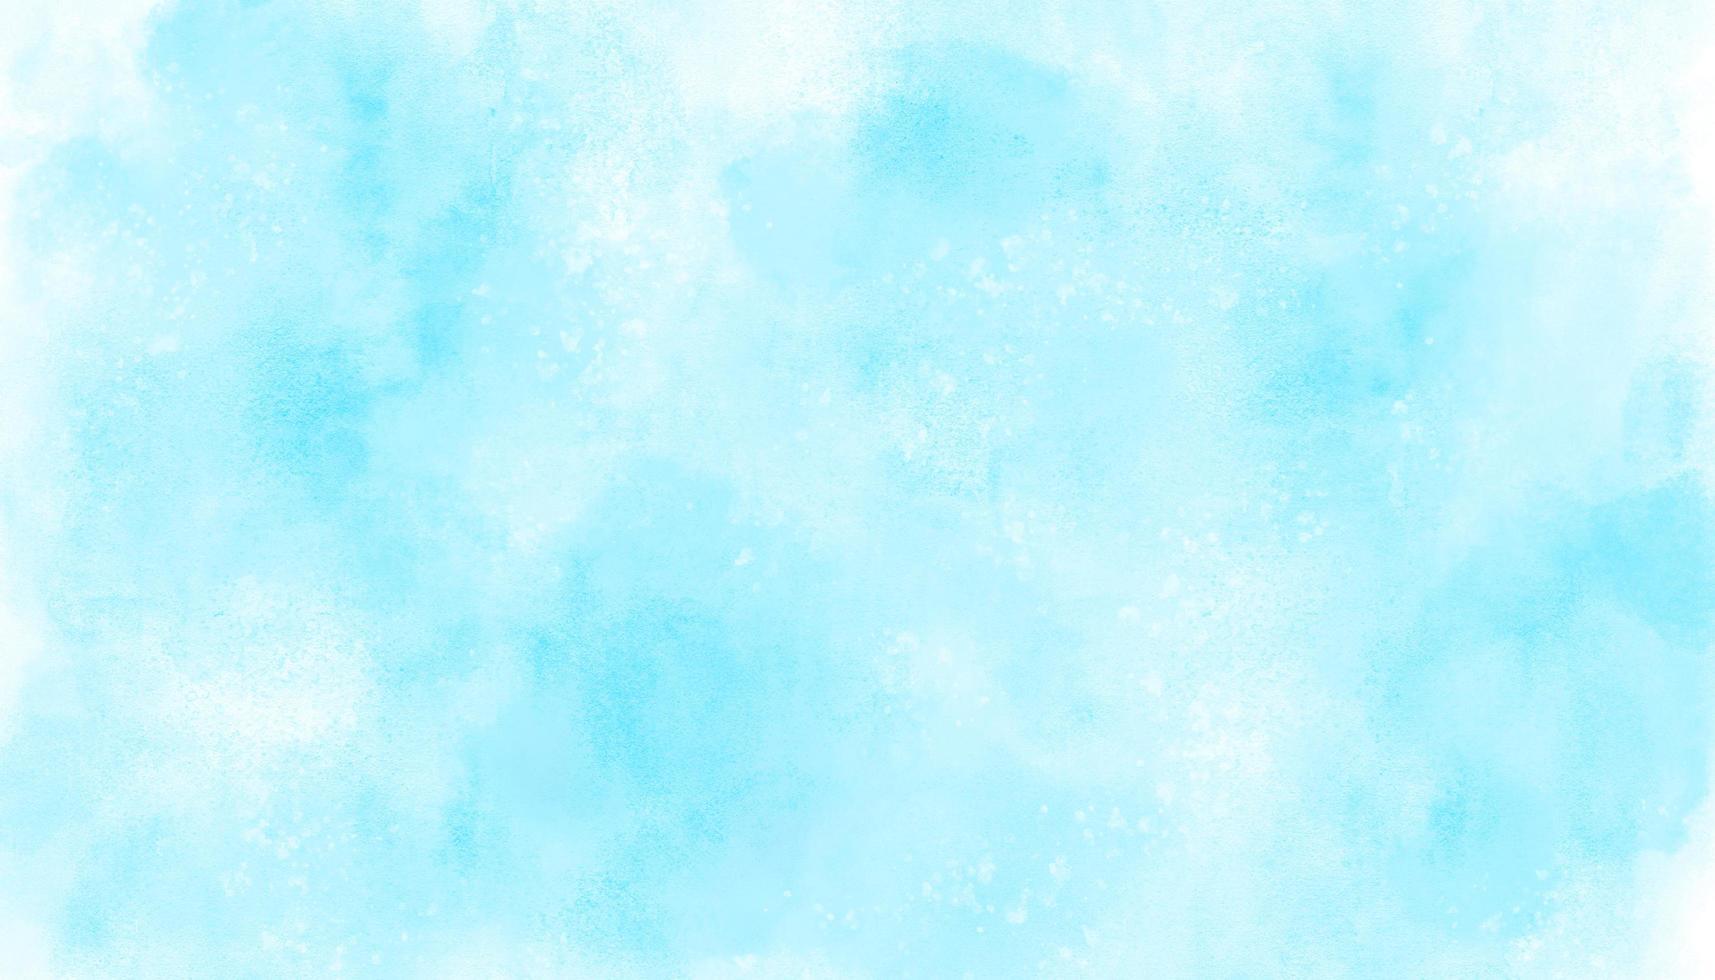 fondo azul acuarela vector